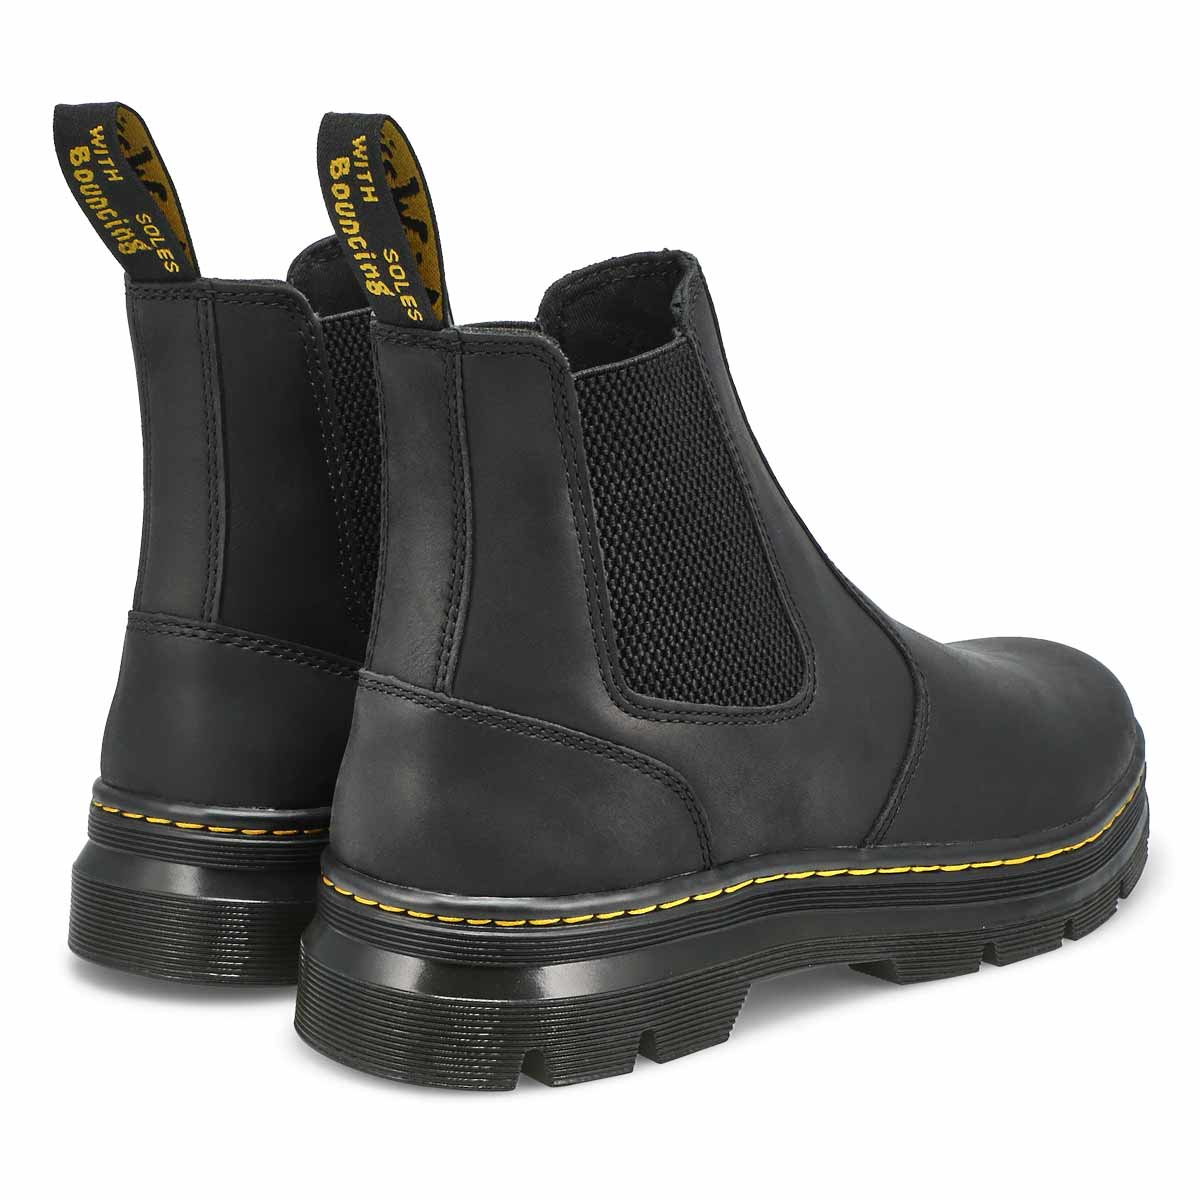 Men's Embury 2976 Chelsea Boot - Black